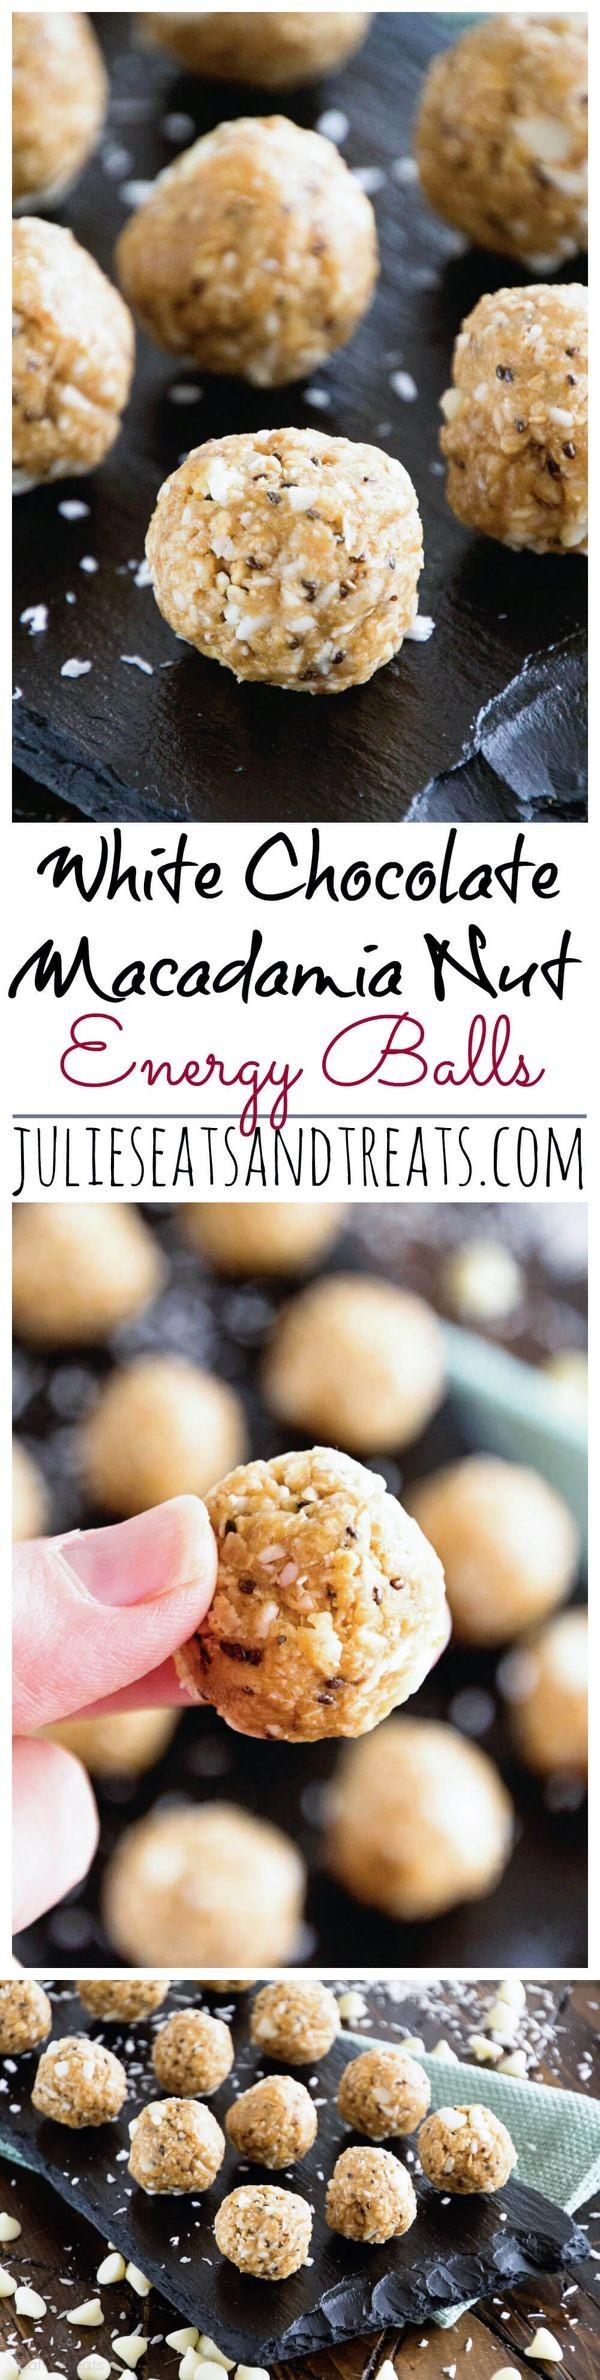 White Chocolate Macadamia Nut Energy Balls